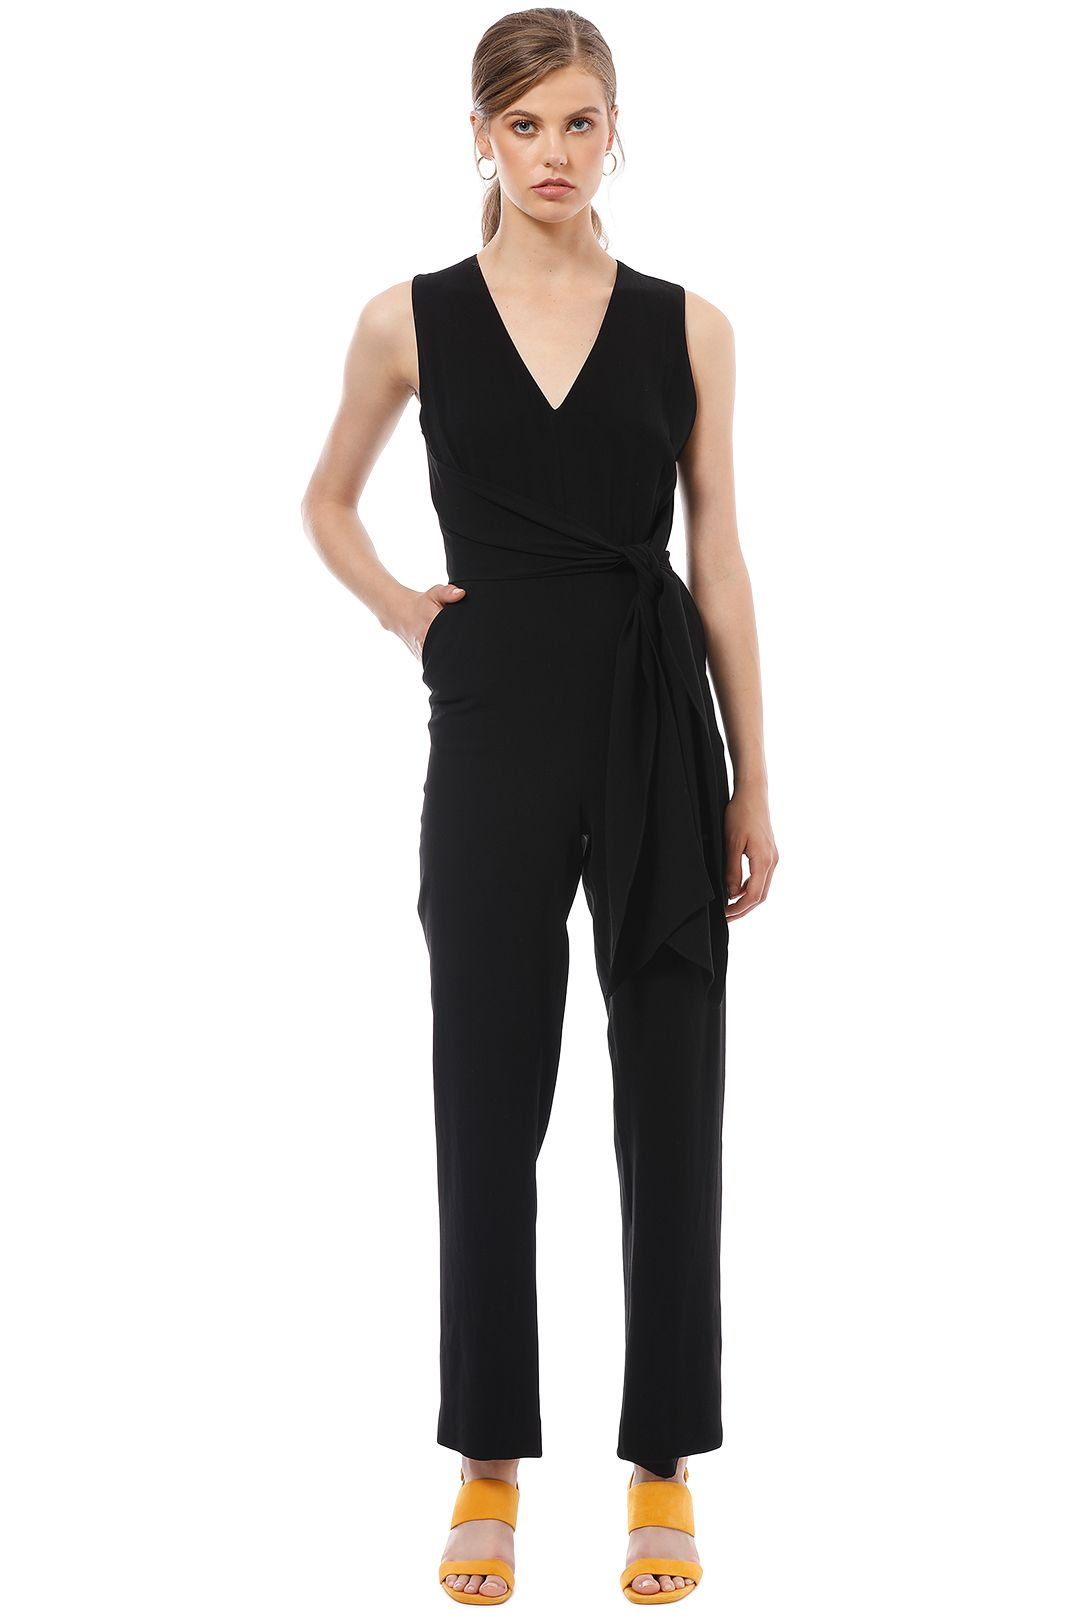 Saba - Zinnia Jumpsuit - Black - Front